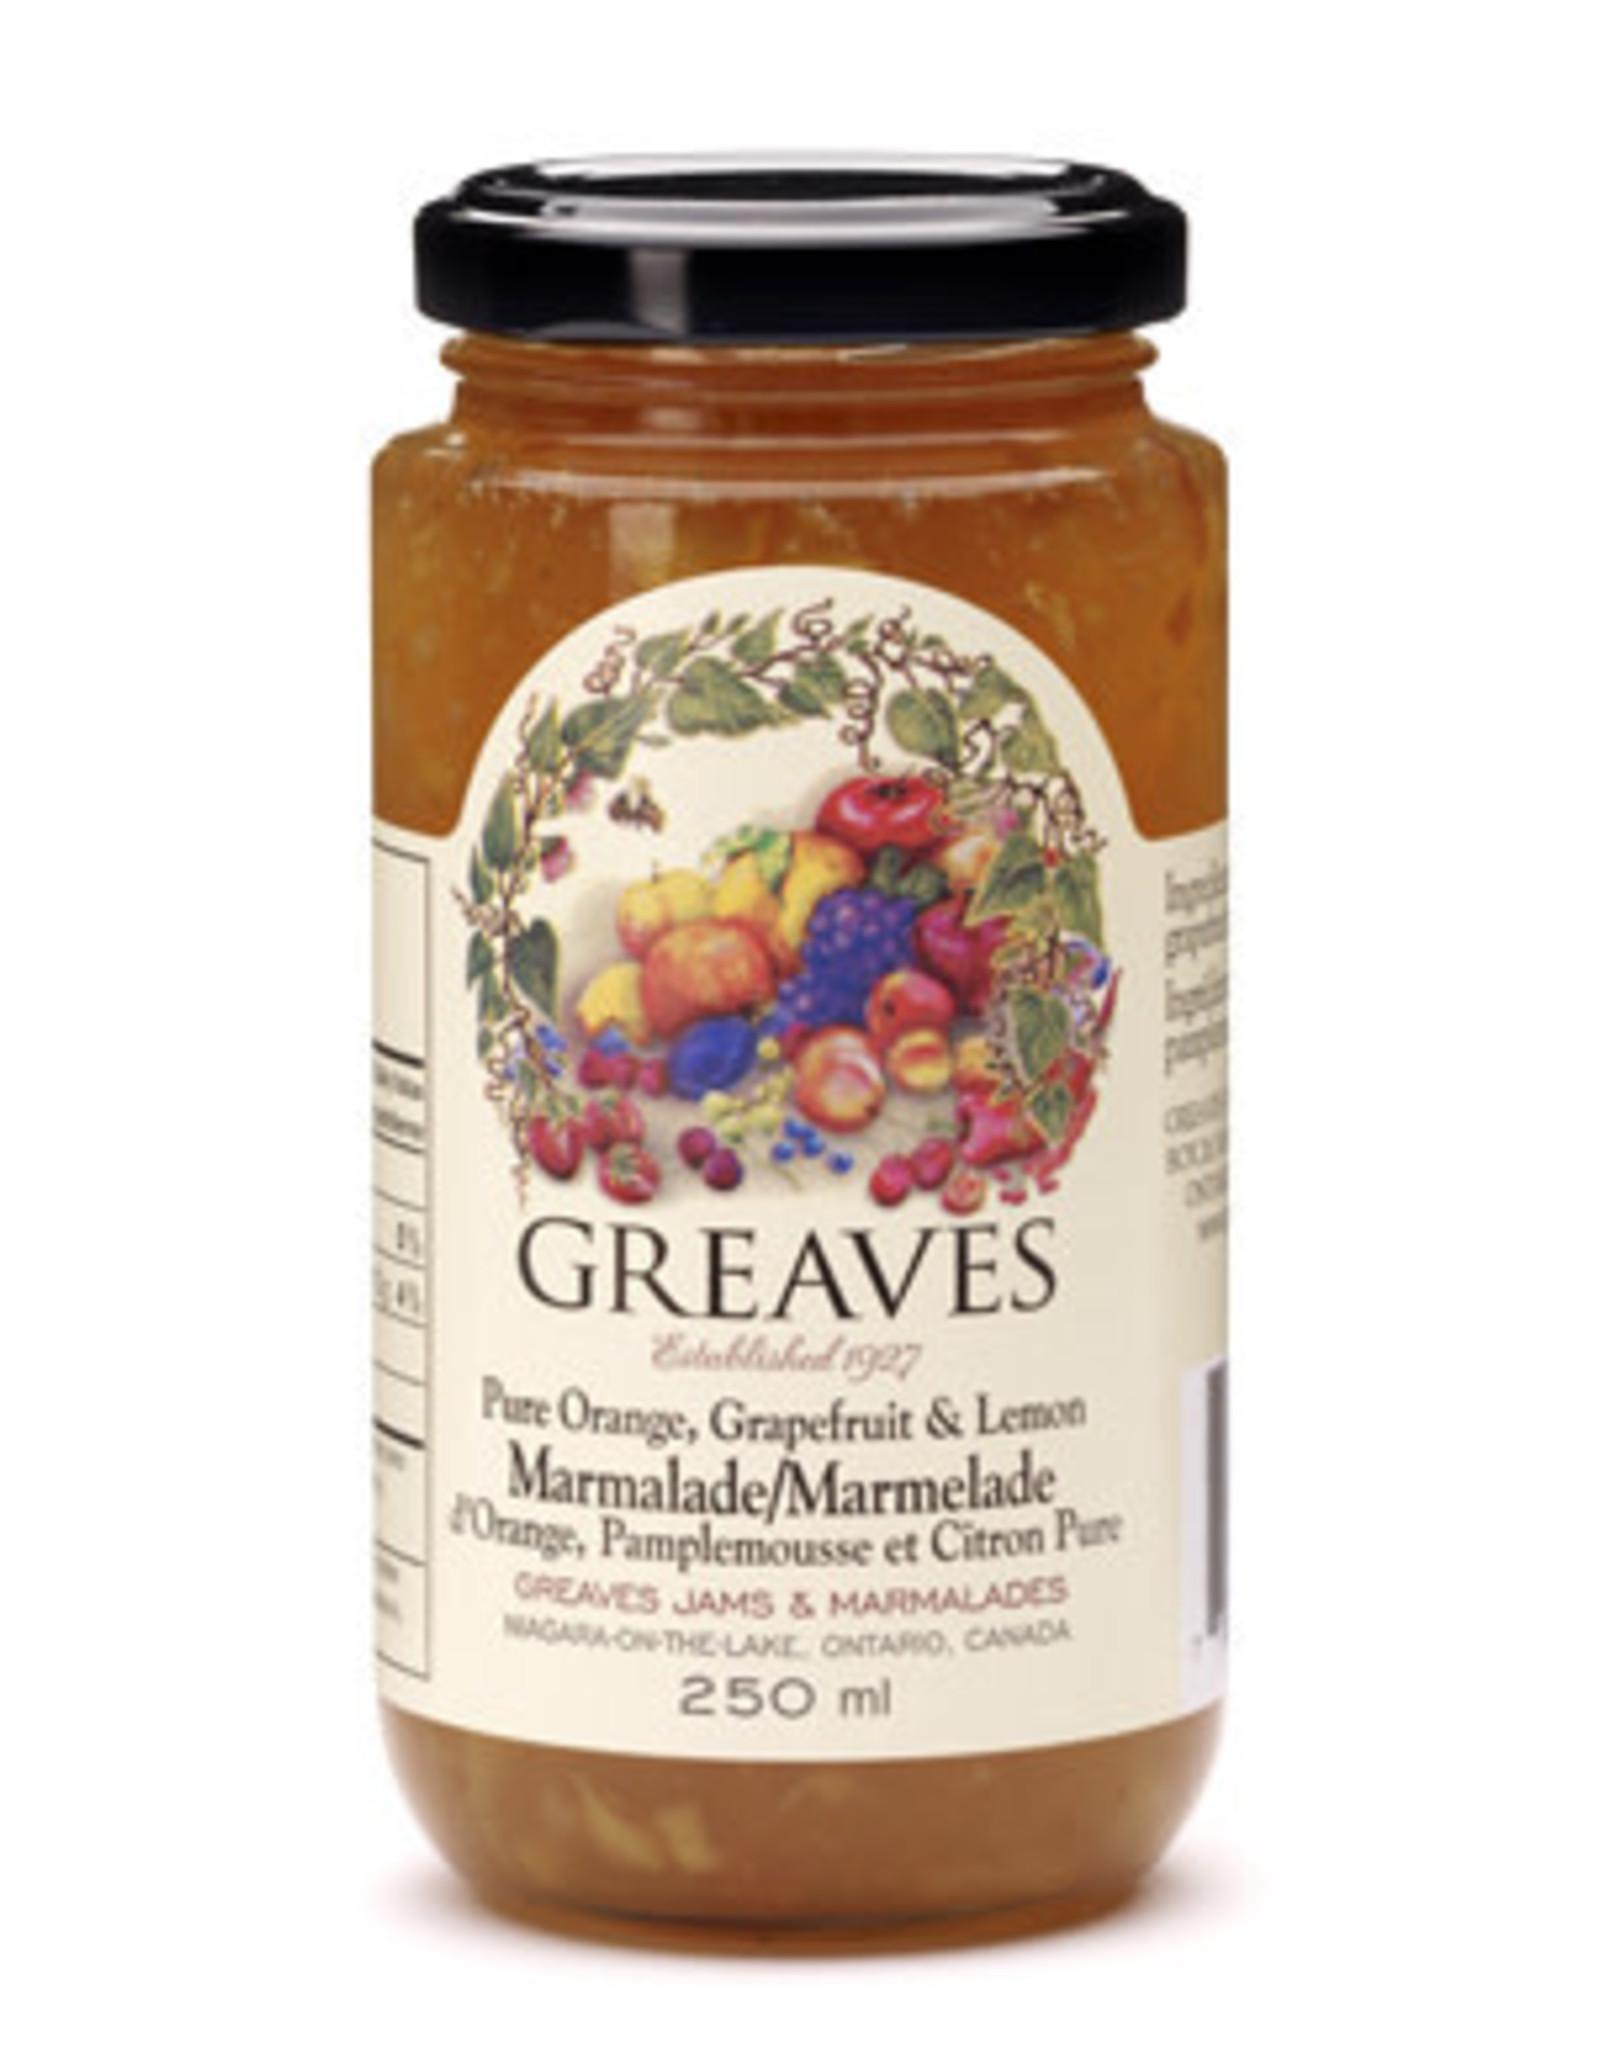 Greaves Jams & Marmalades Ltd. Greaves, Grapefruit Orange Lemon Marmalade, 250ml